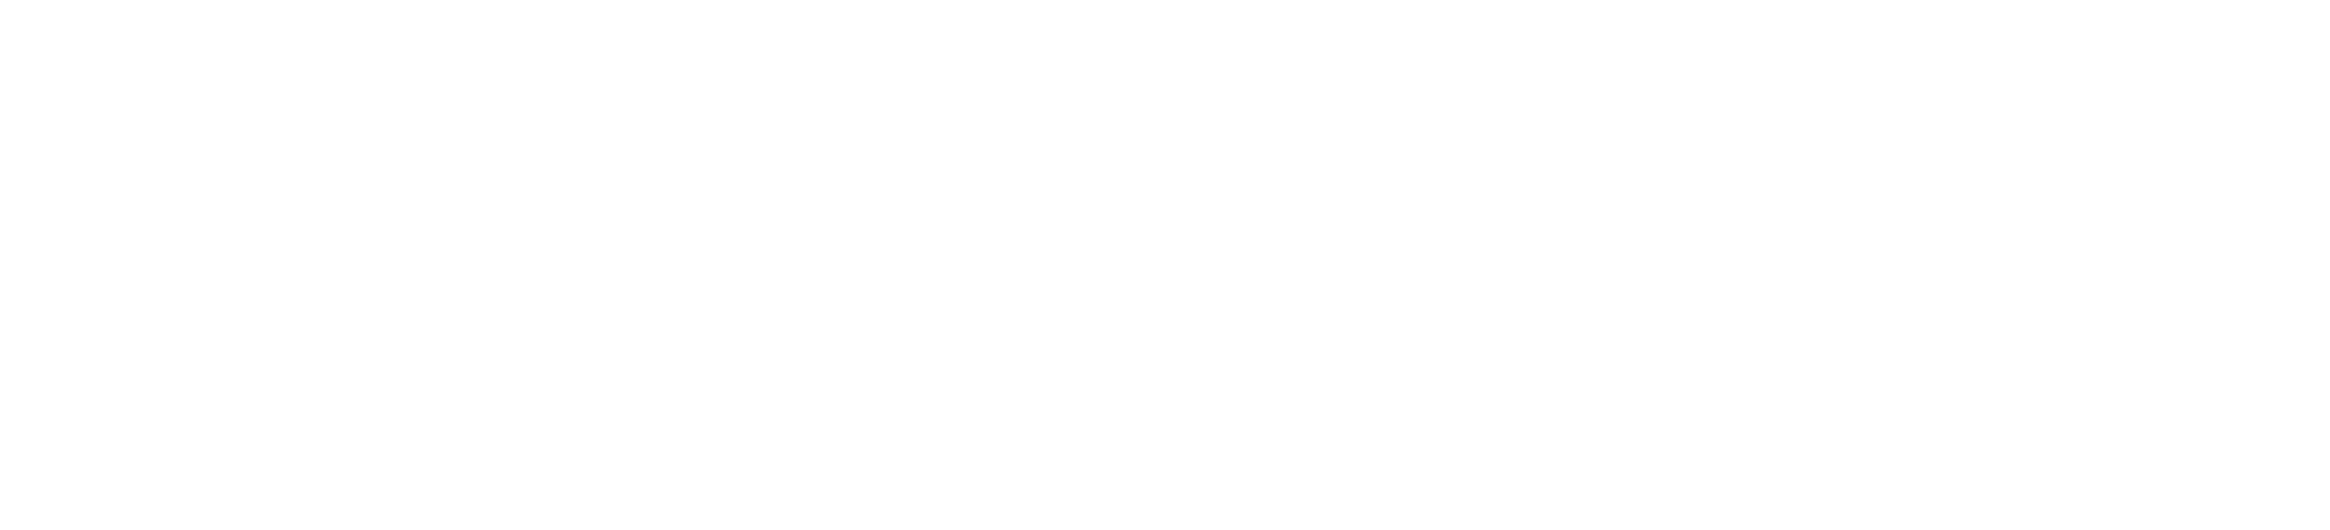 dakota marketplace_private equity_GothBlk_Logo_WH_V4-01